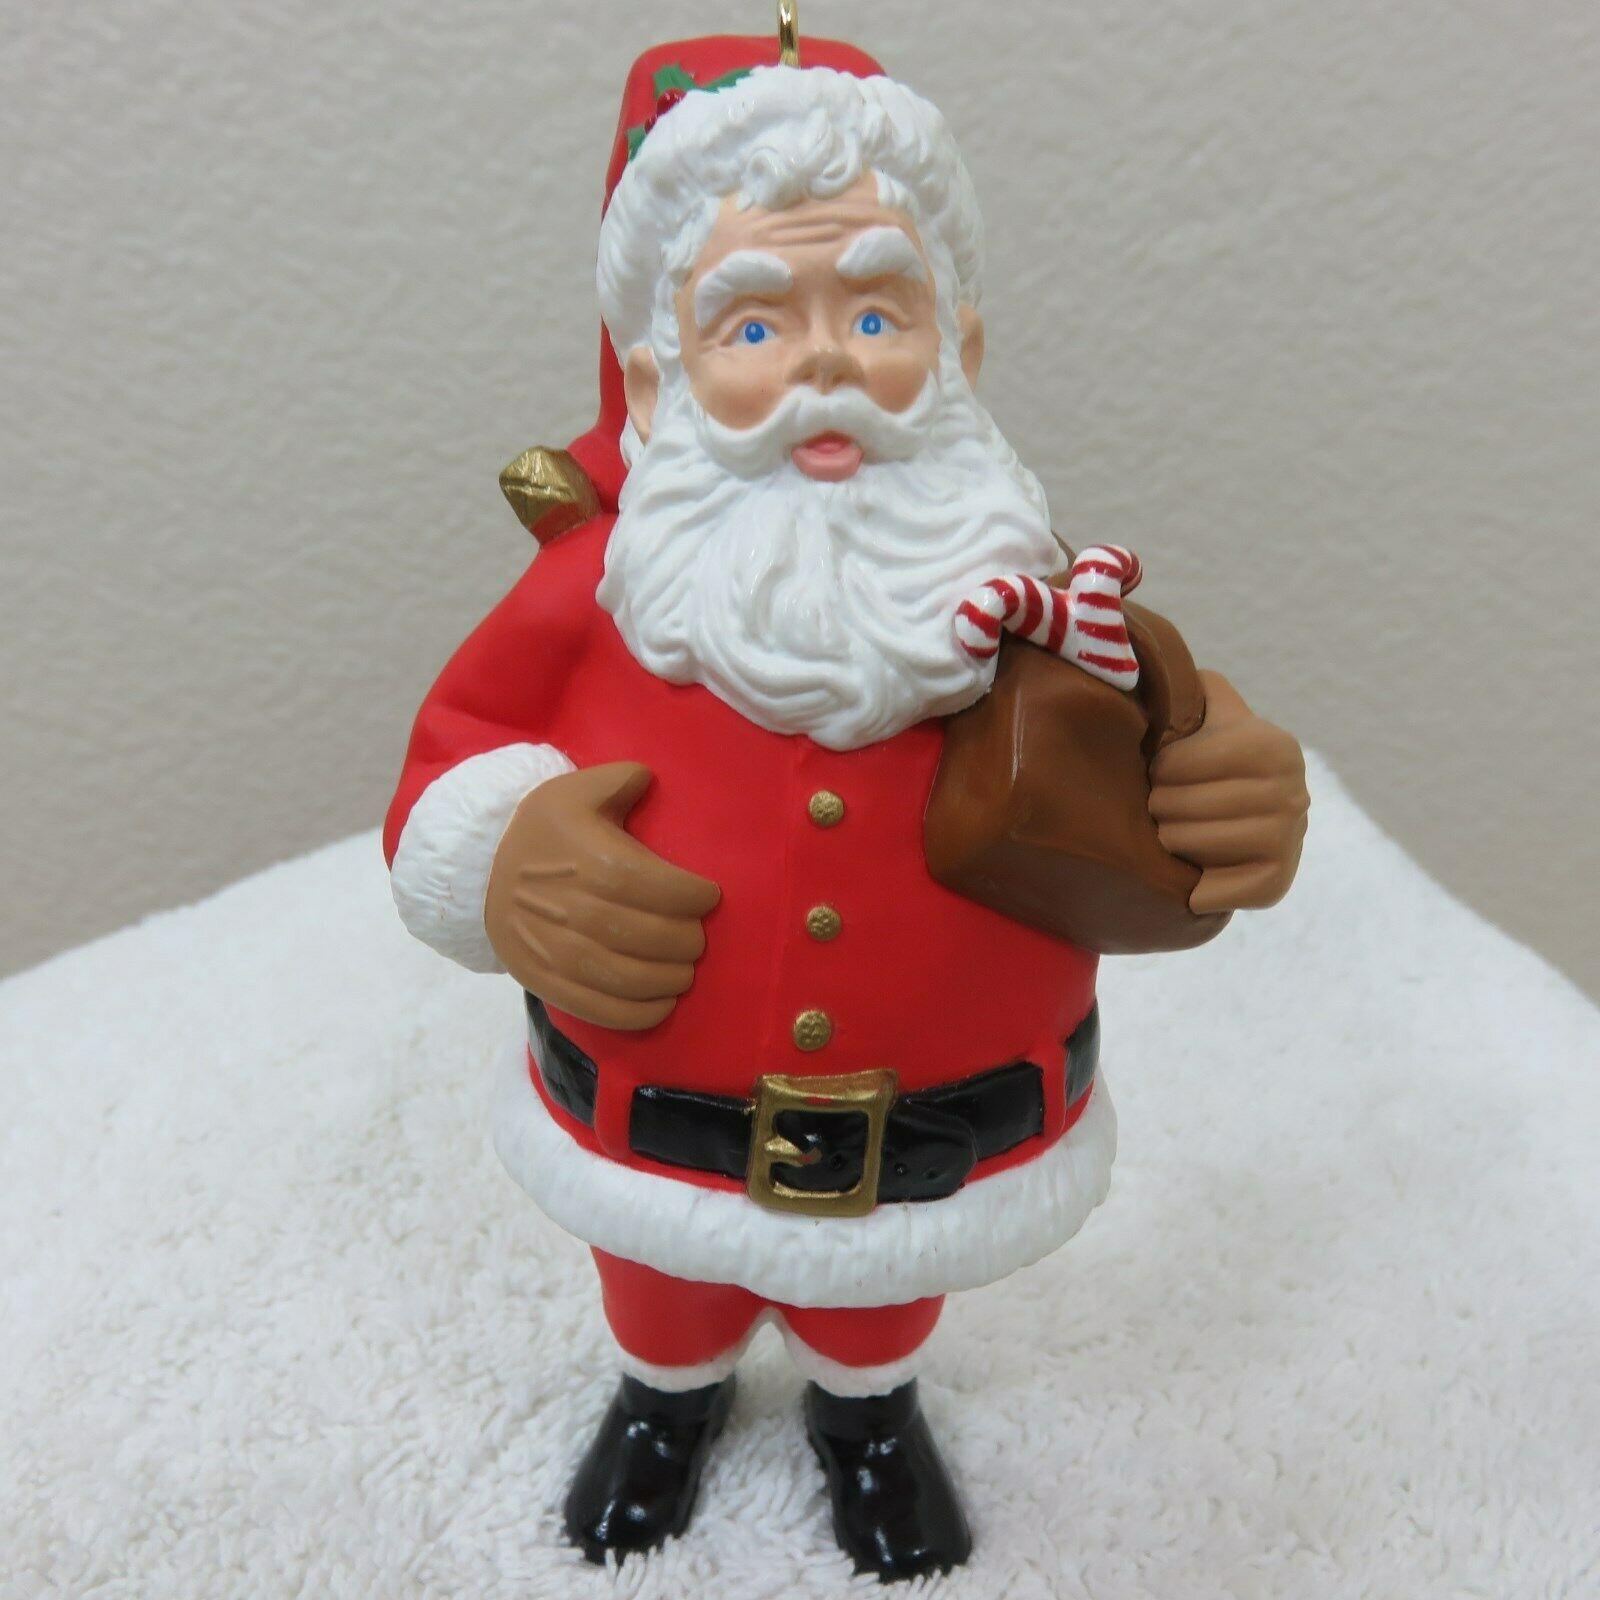 Vintage 1996 Hallmark Keepsake Ornament Santa in Original Box